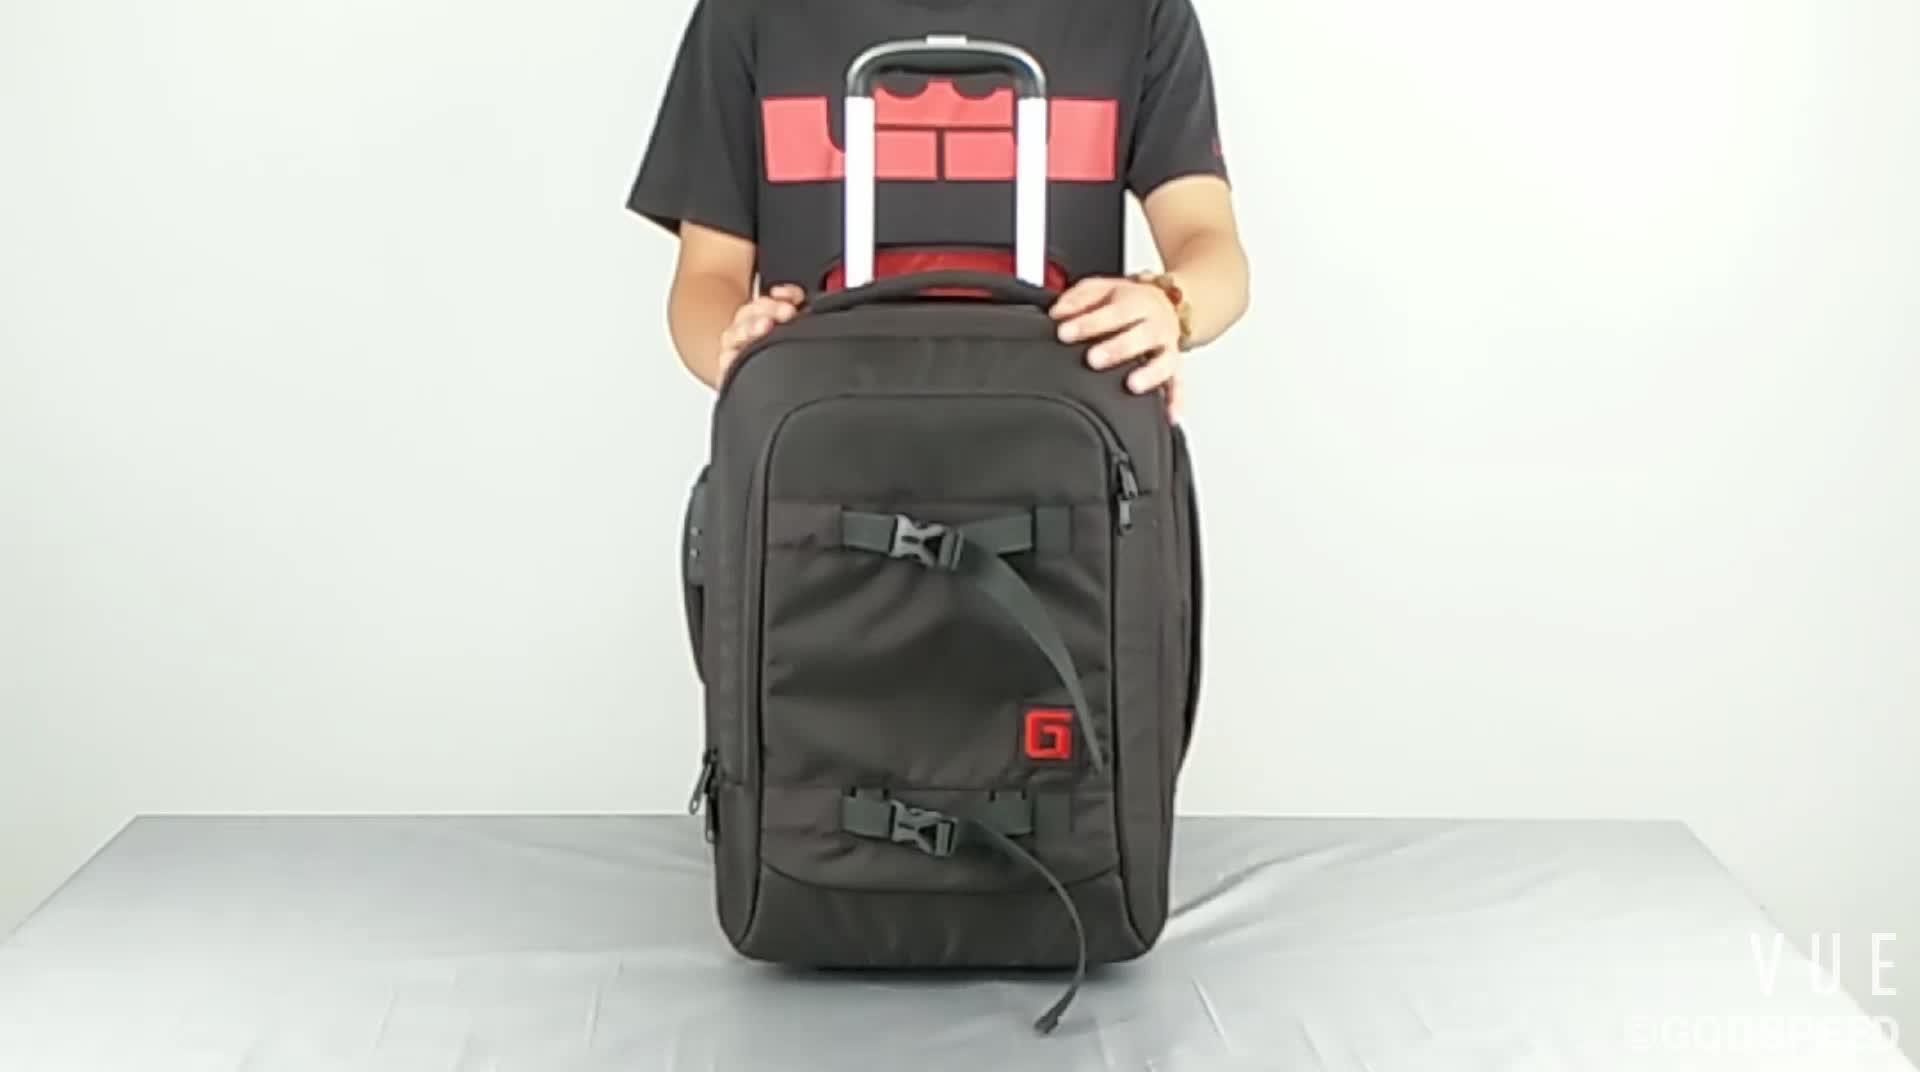 2018 Godspeed SY1516 Large Capacity Camping Trolley SLR Camera Backpack